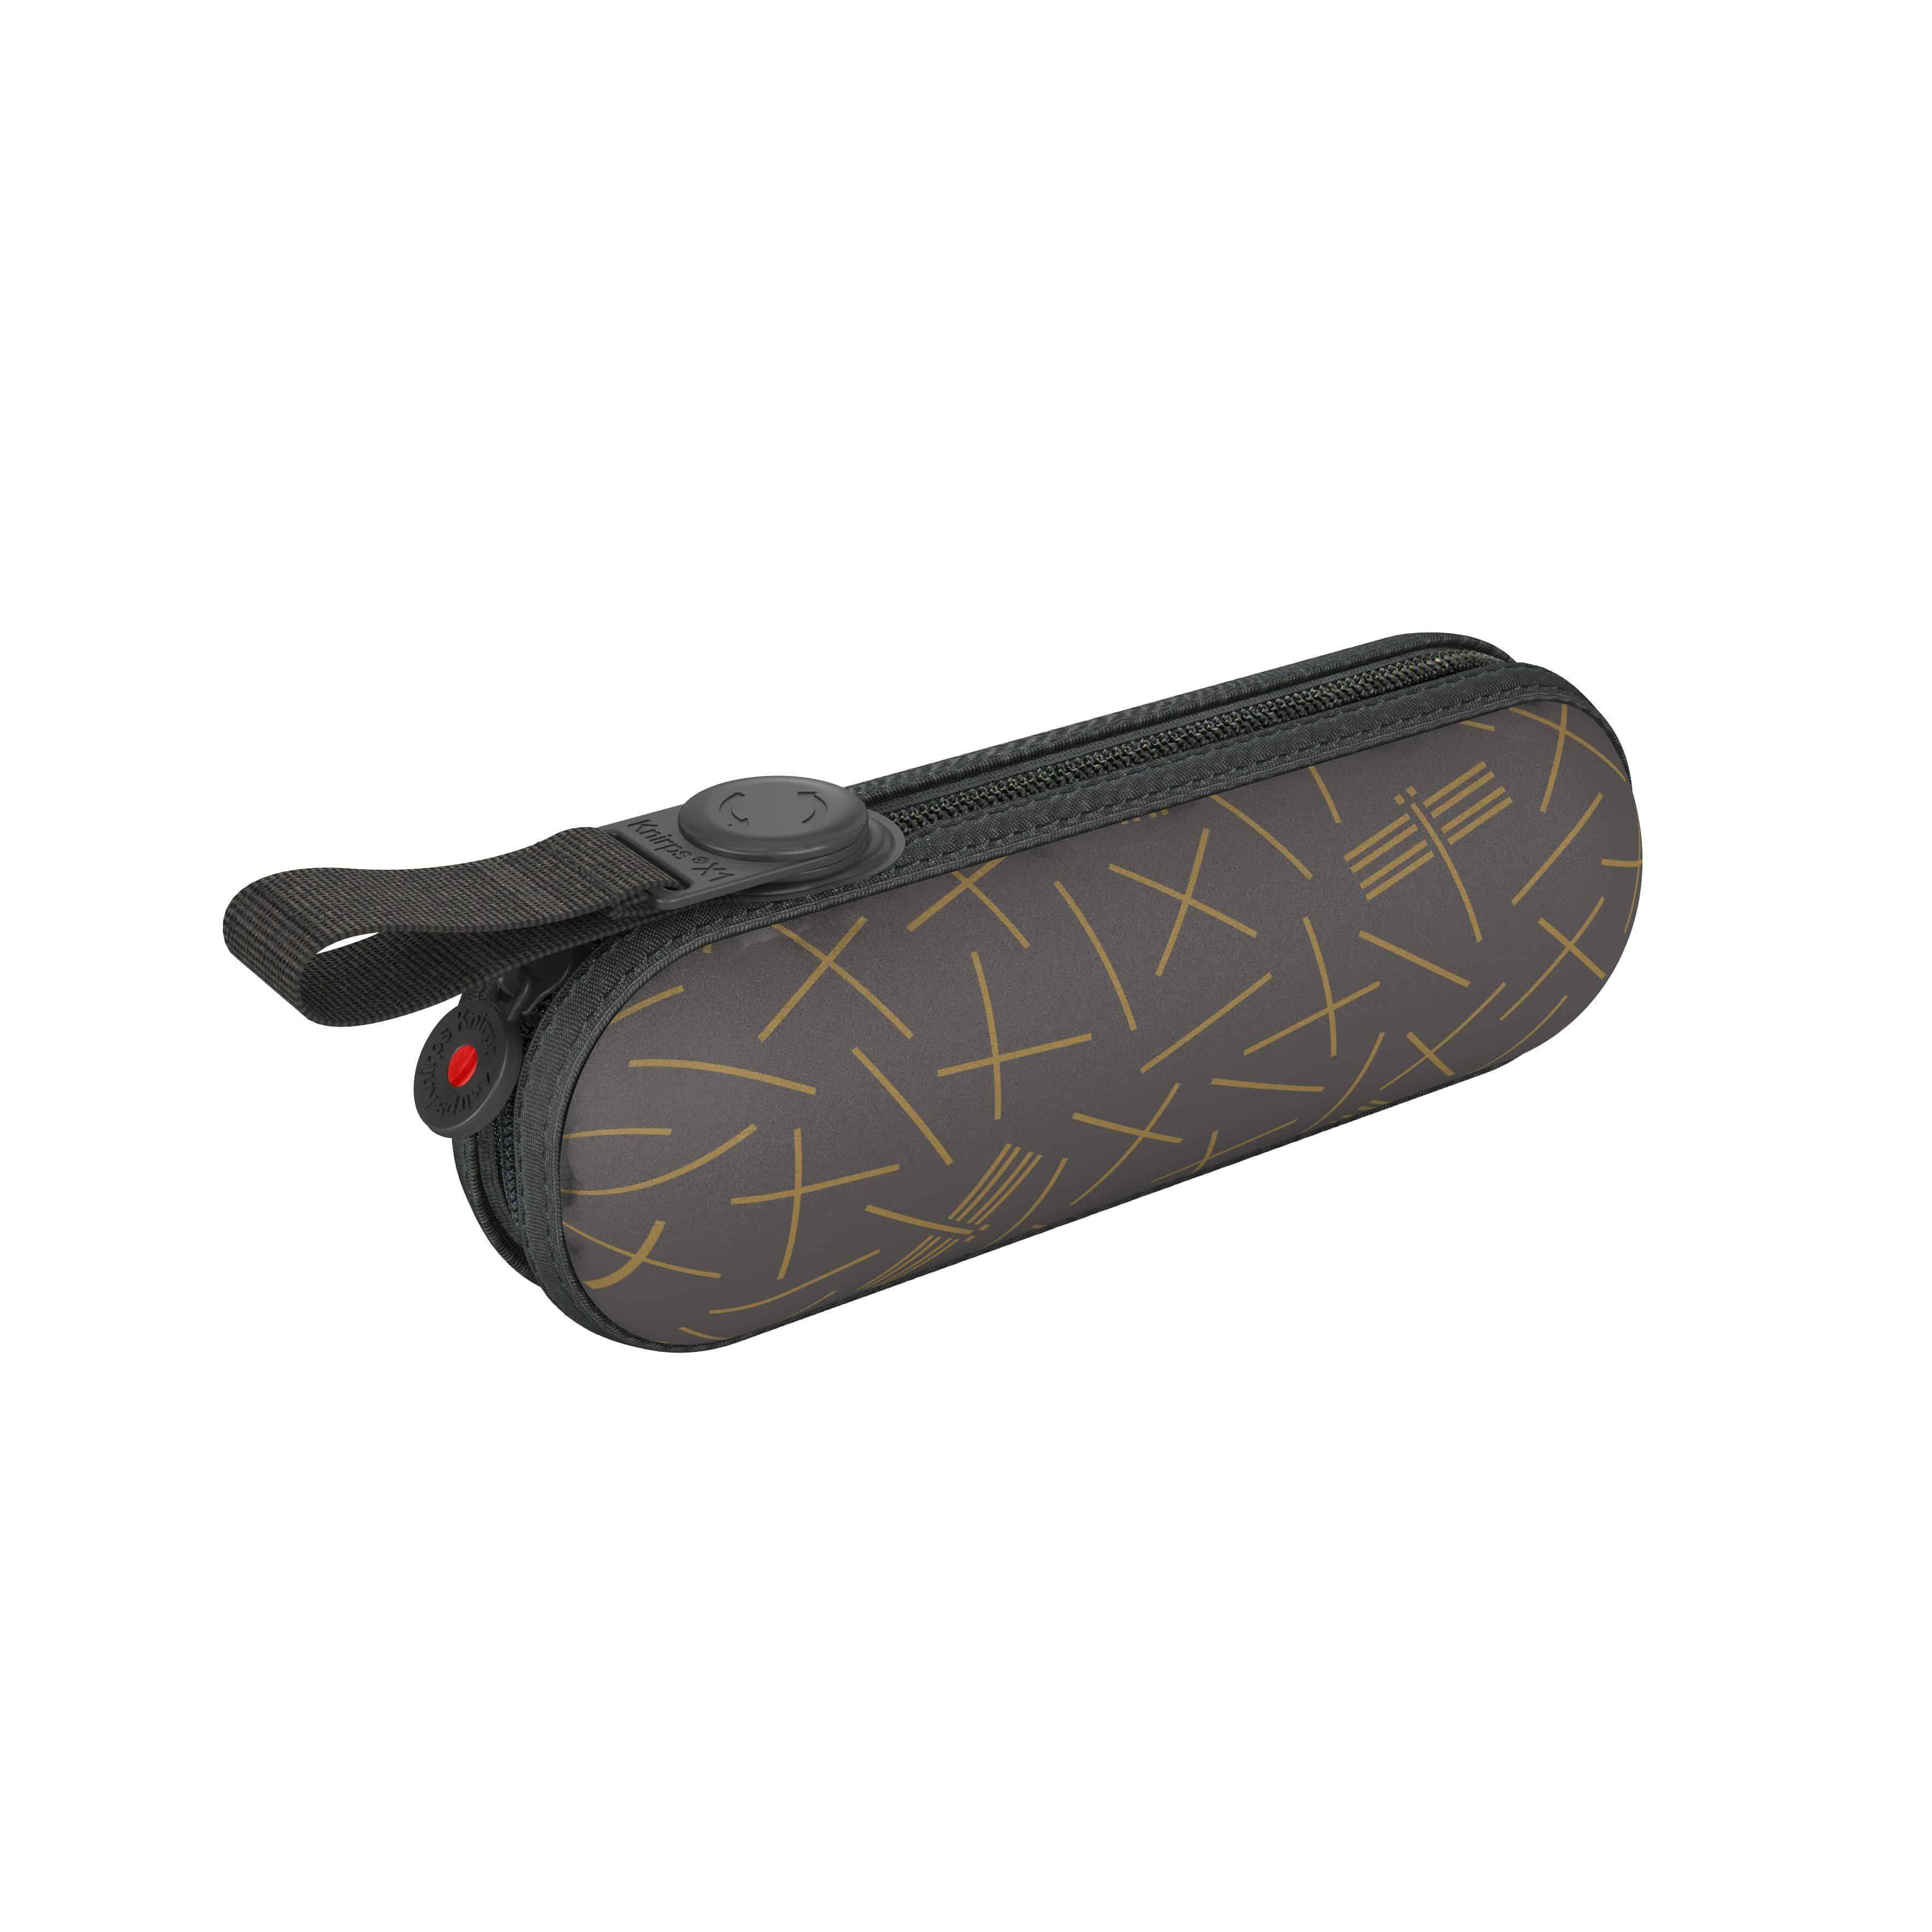 Knirps Umbrella Knirps X1 NUNO tombo stone ecorepel with UV Protection - photo 2